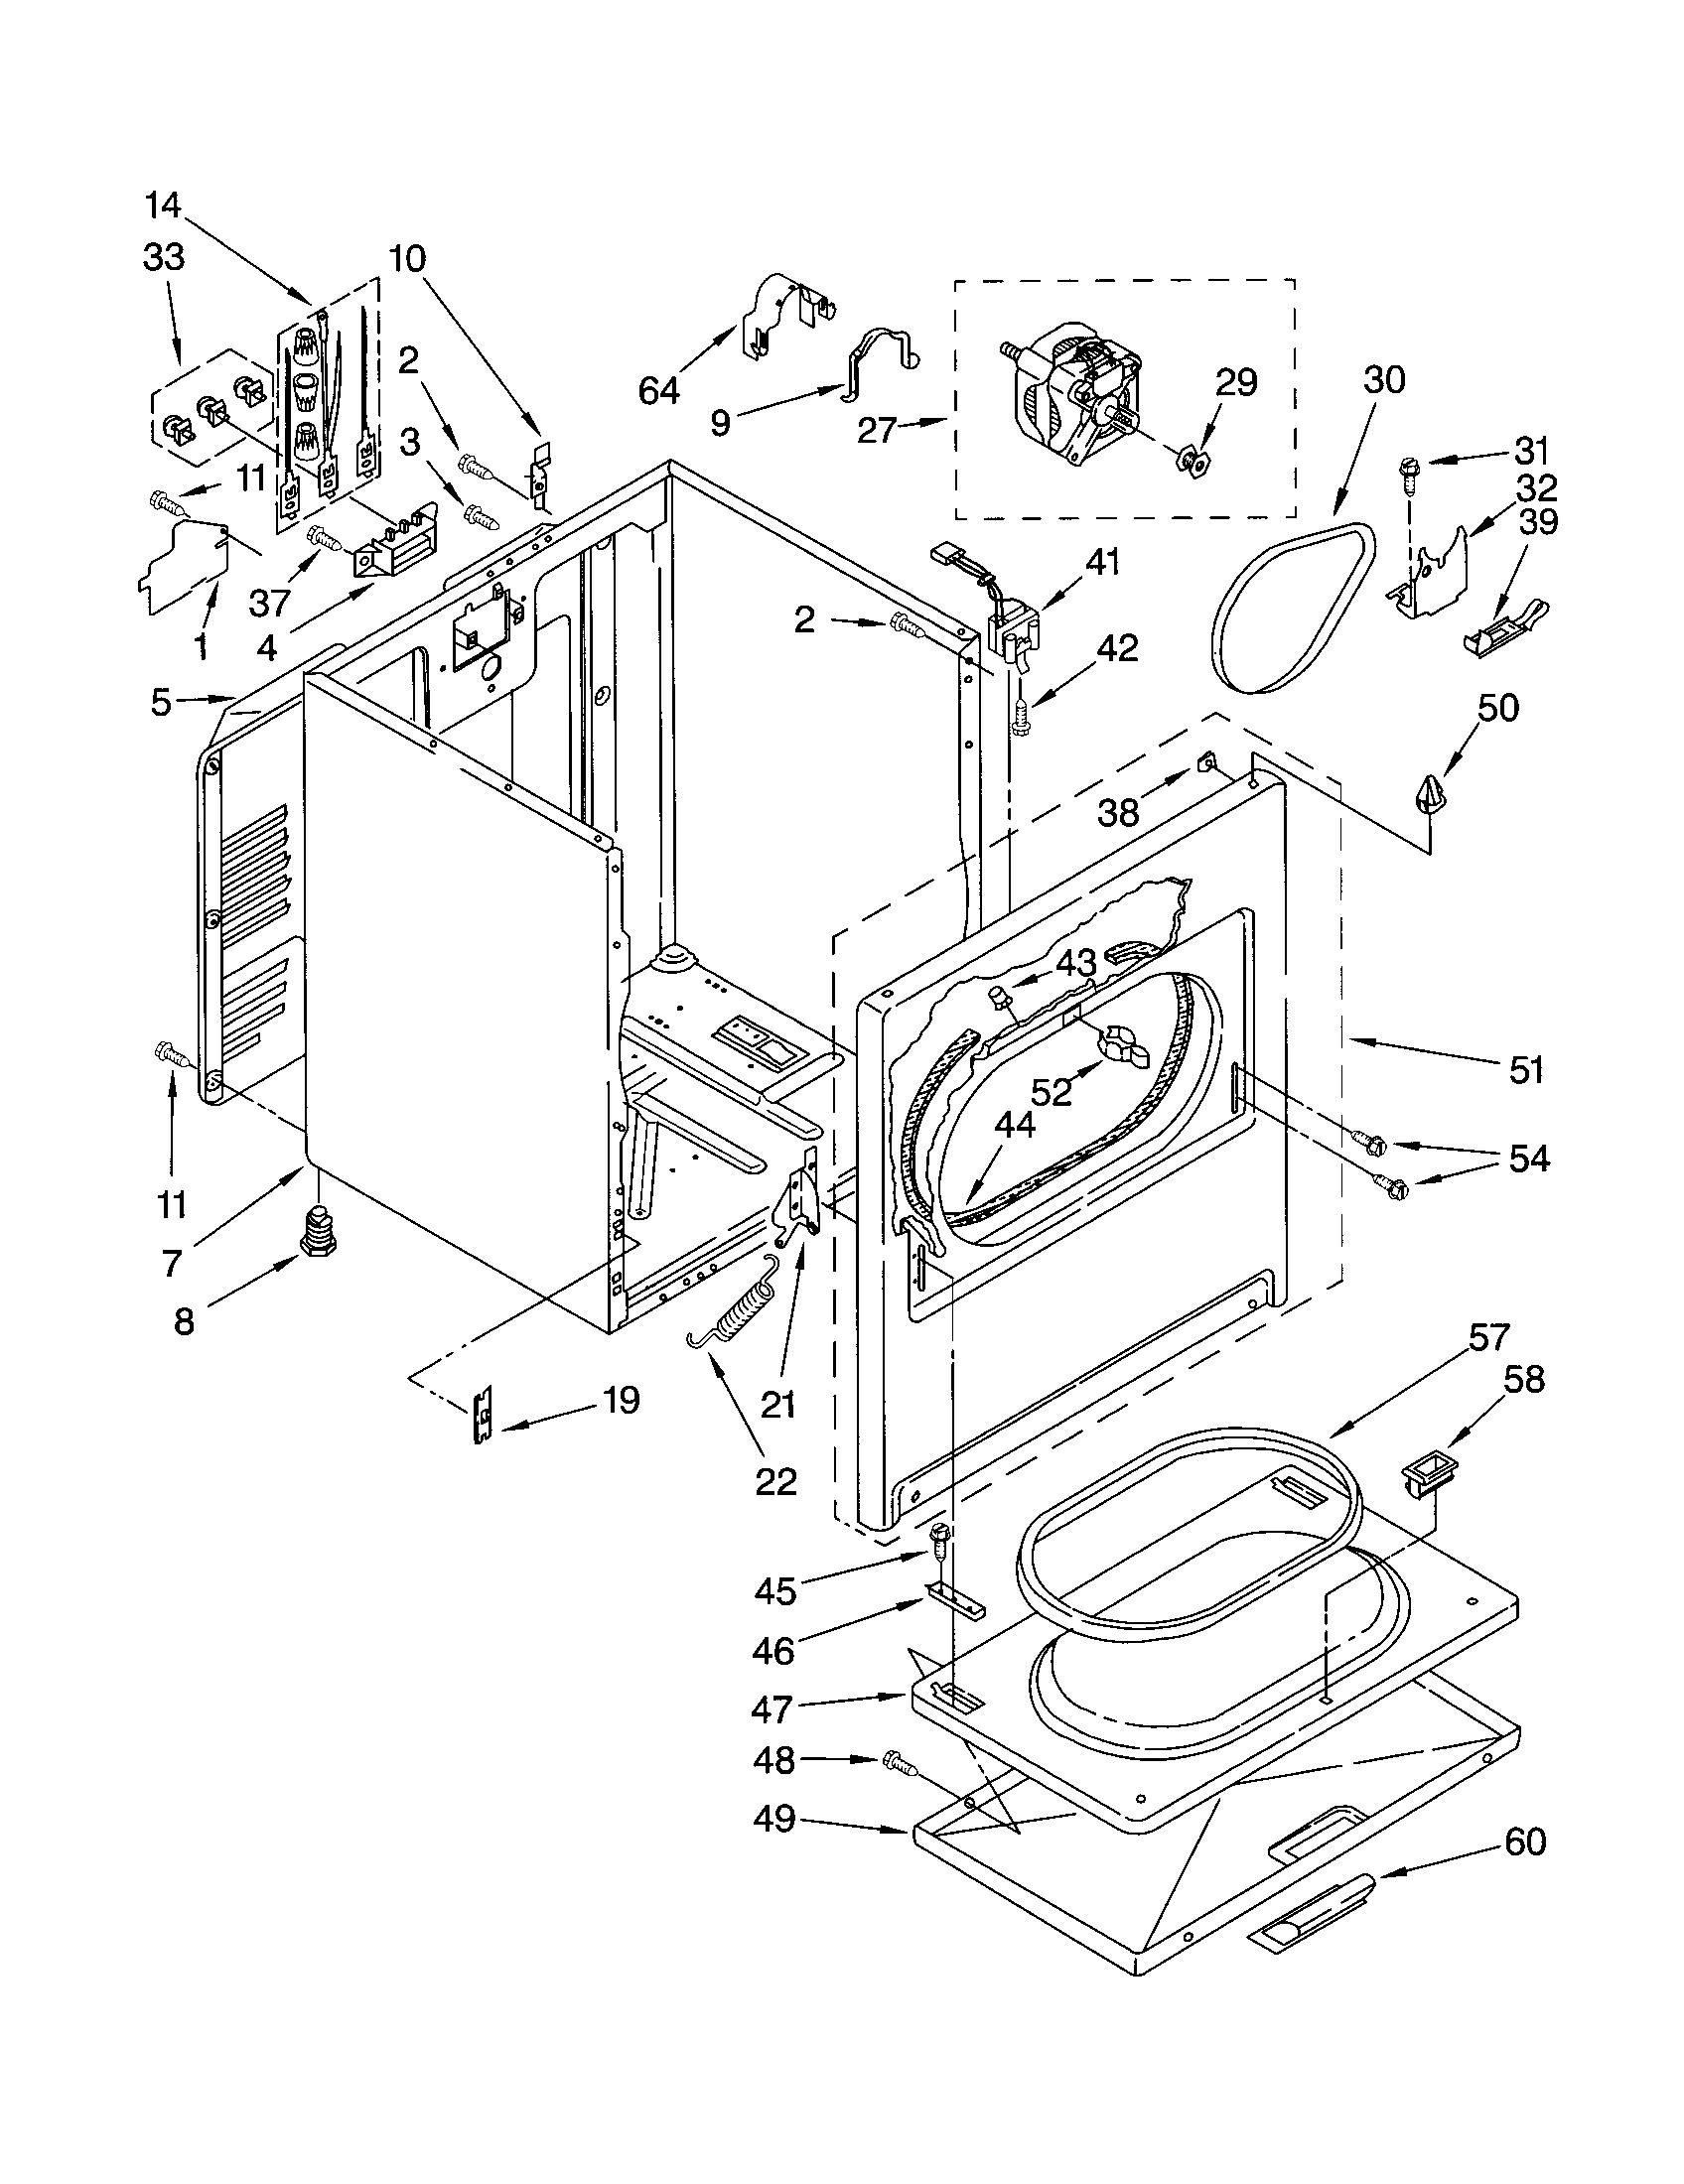 Kenmore model 11062612101 residential dryer genuine parts